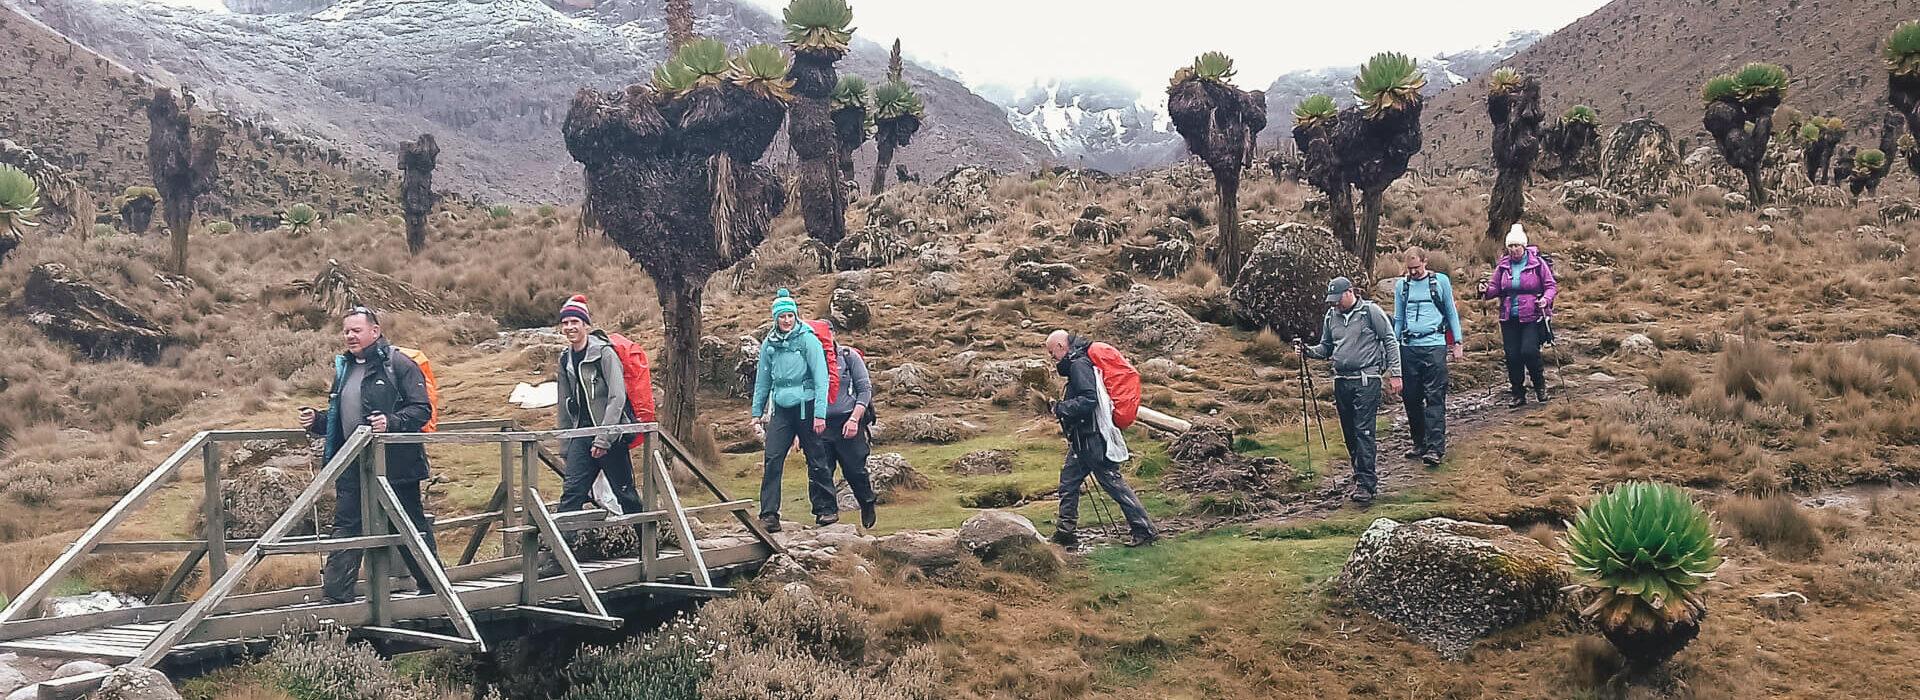 Kenya Tri-Adventure with Earth's Edge 3